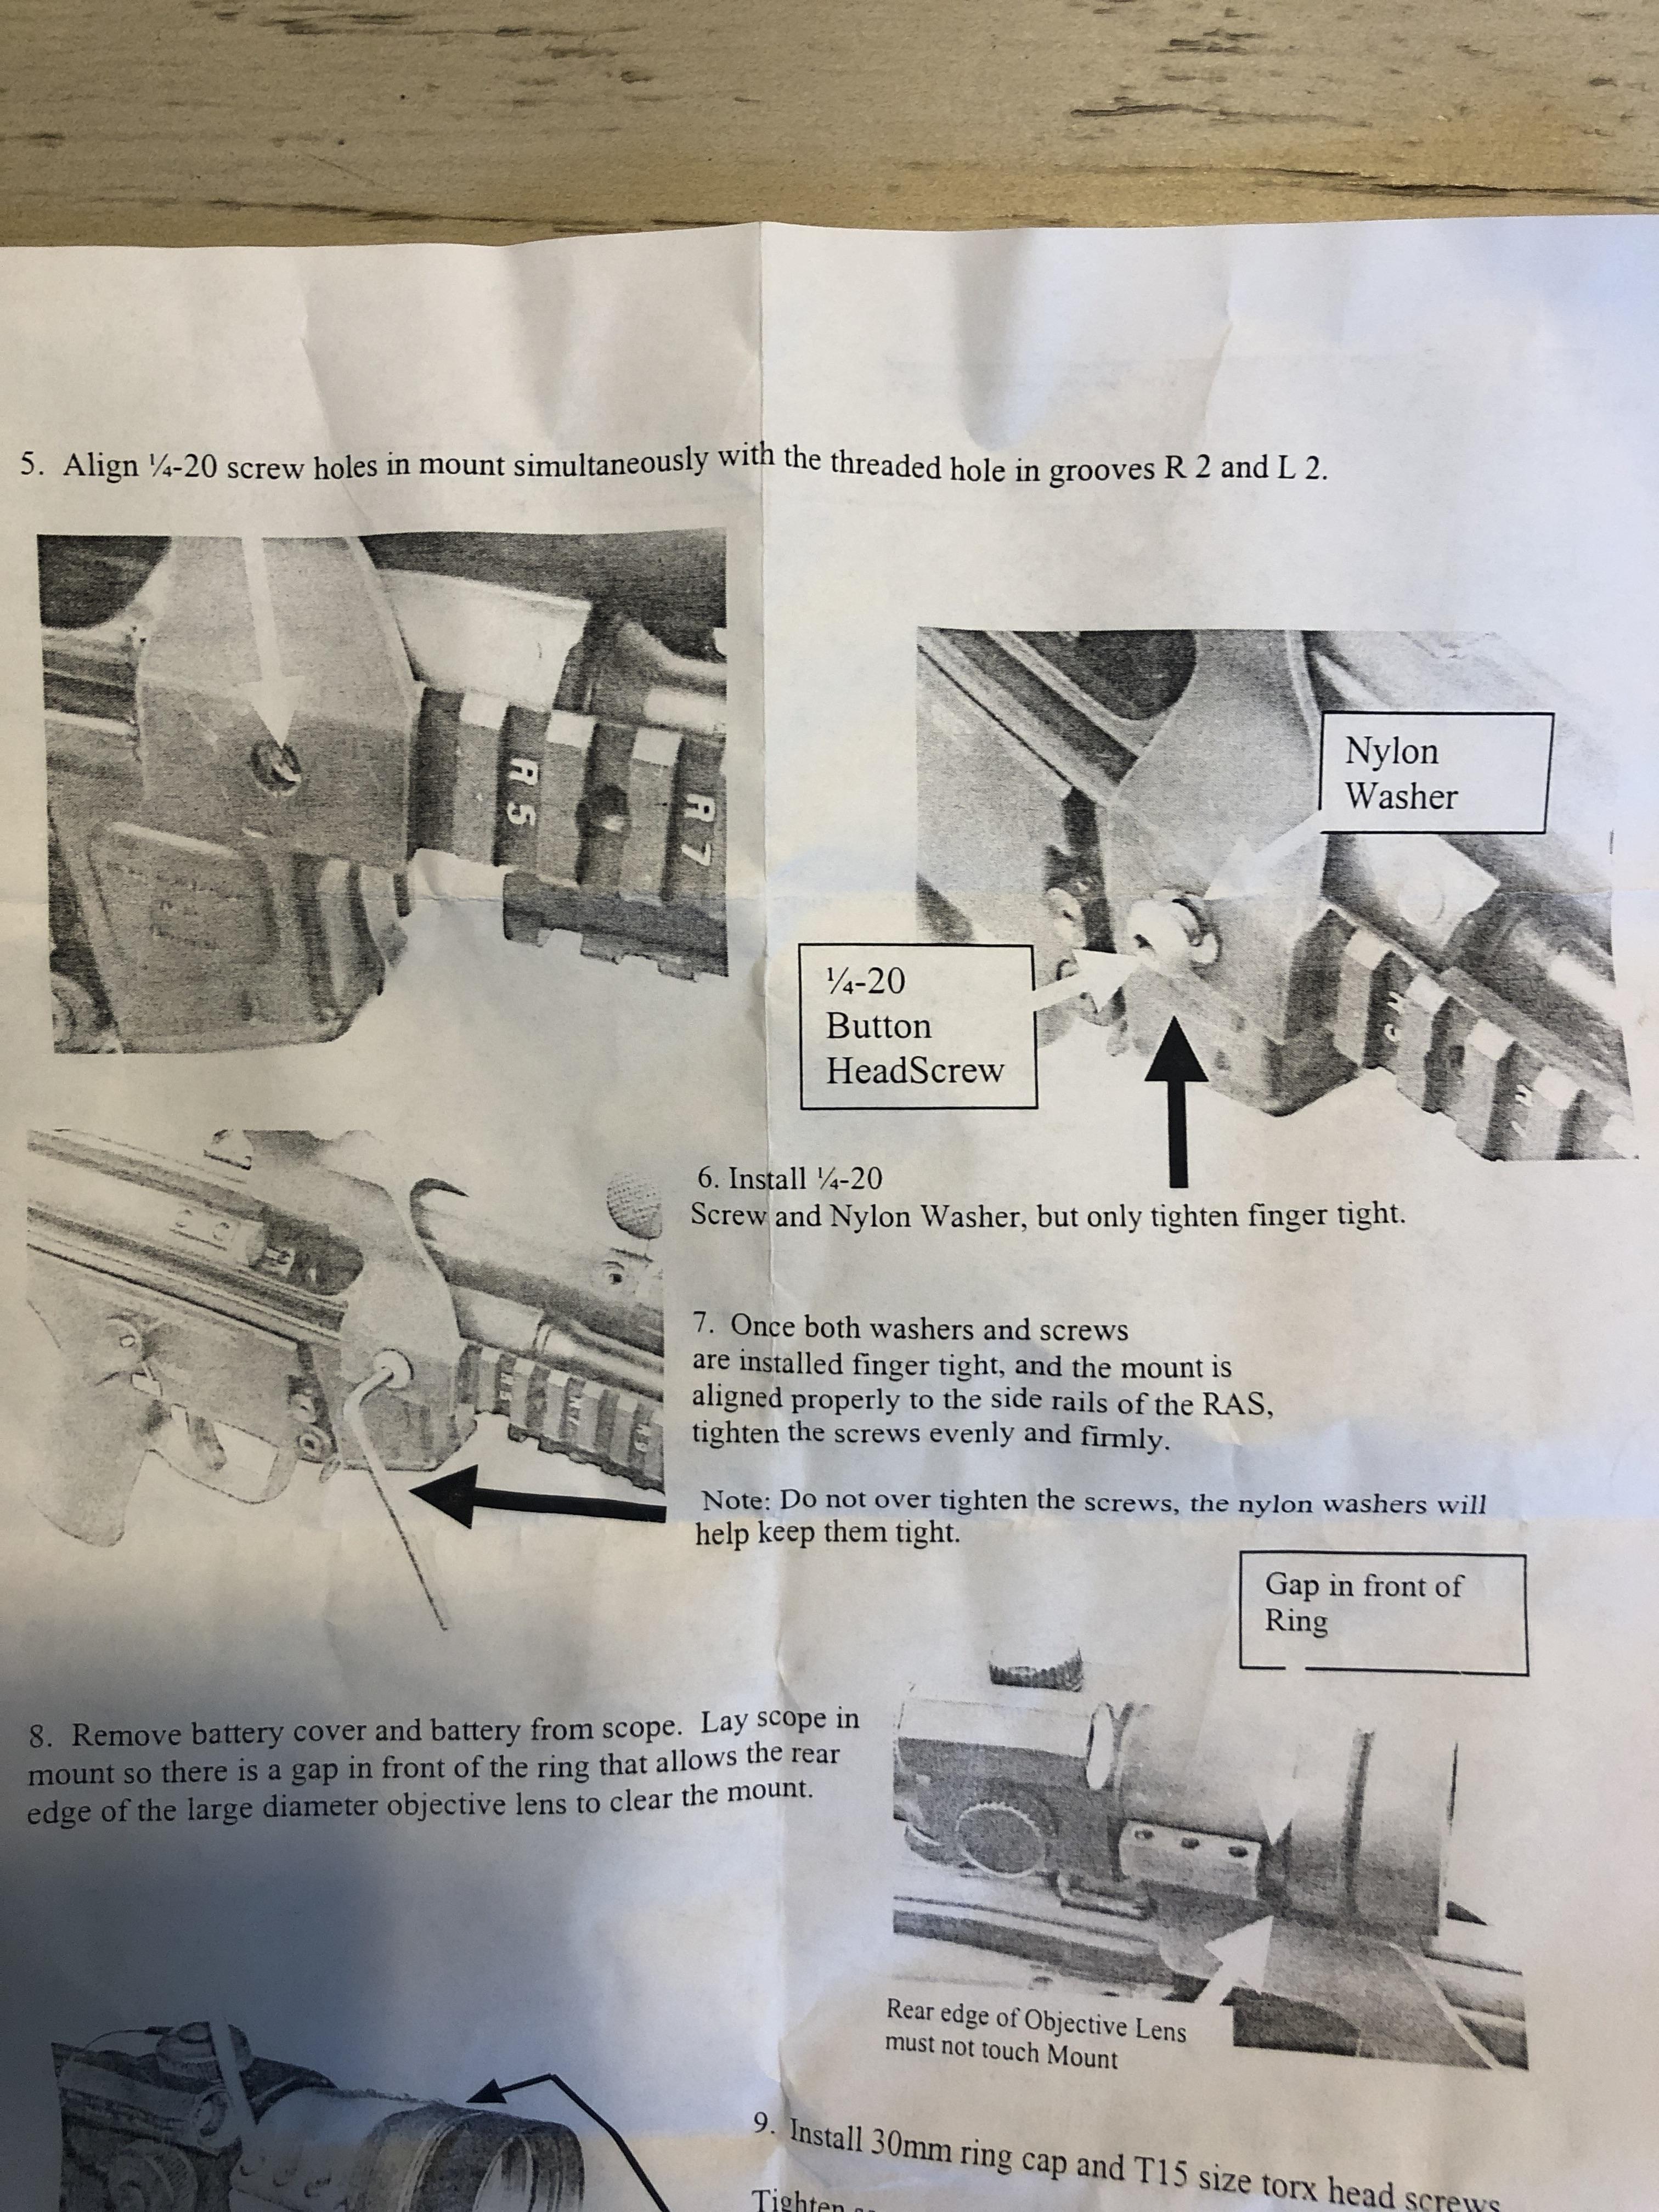 HK MP5/HK53 Surefire tri-rail Hand guards-image_1594310349583.jpg